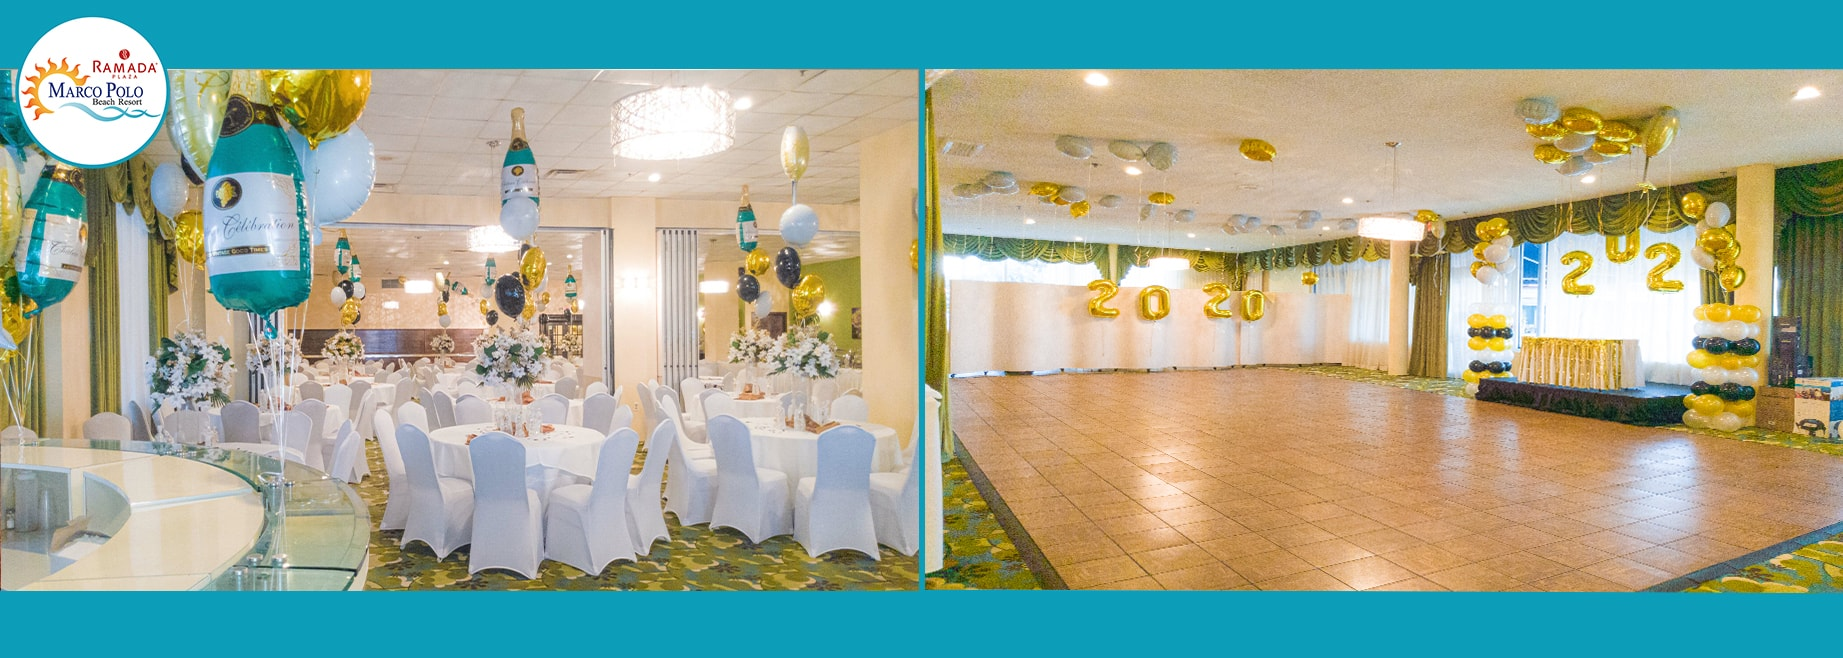 Wedding set up at Marco Polo Beach Resort